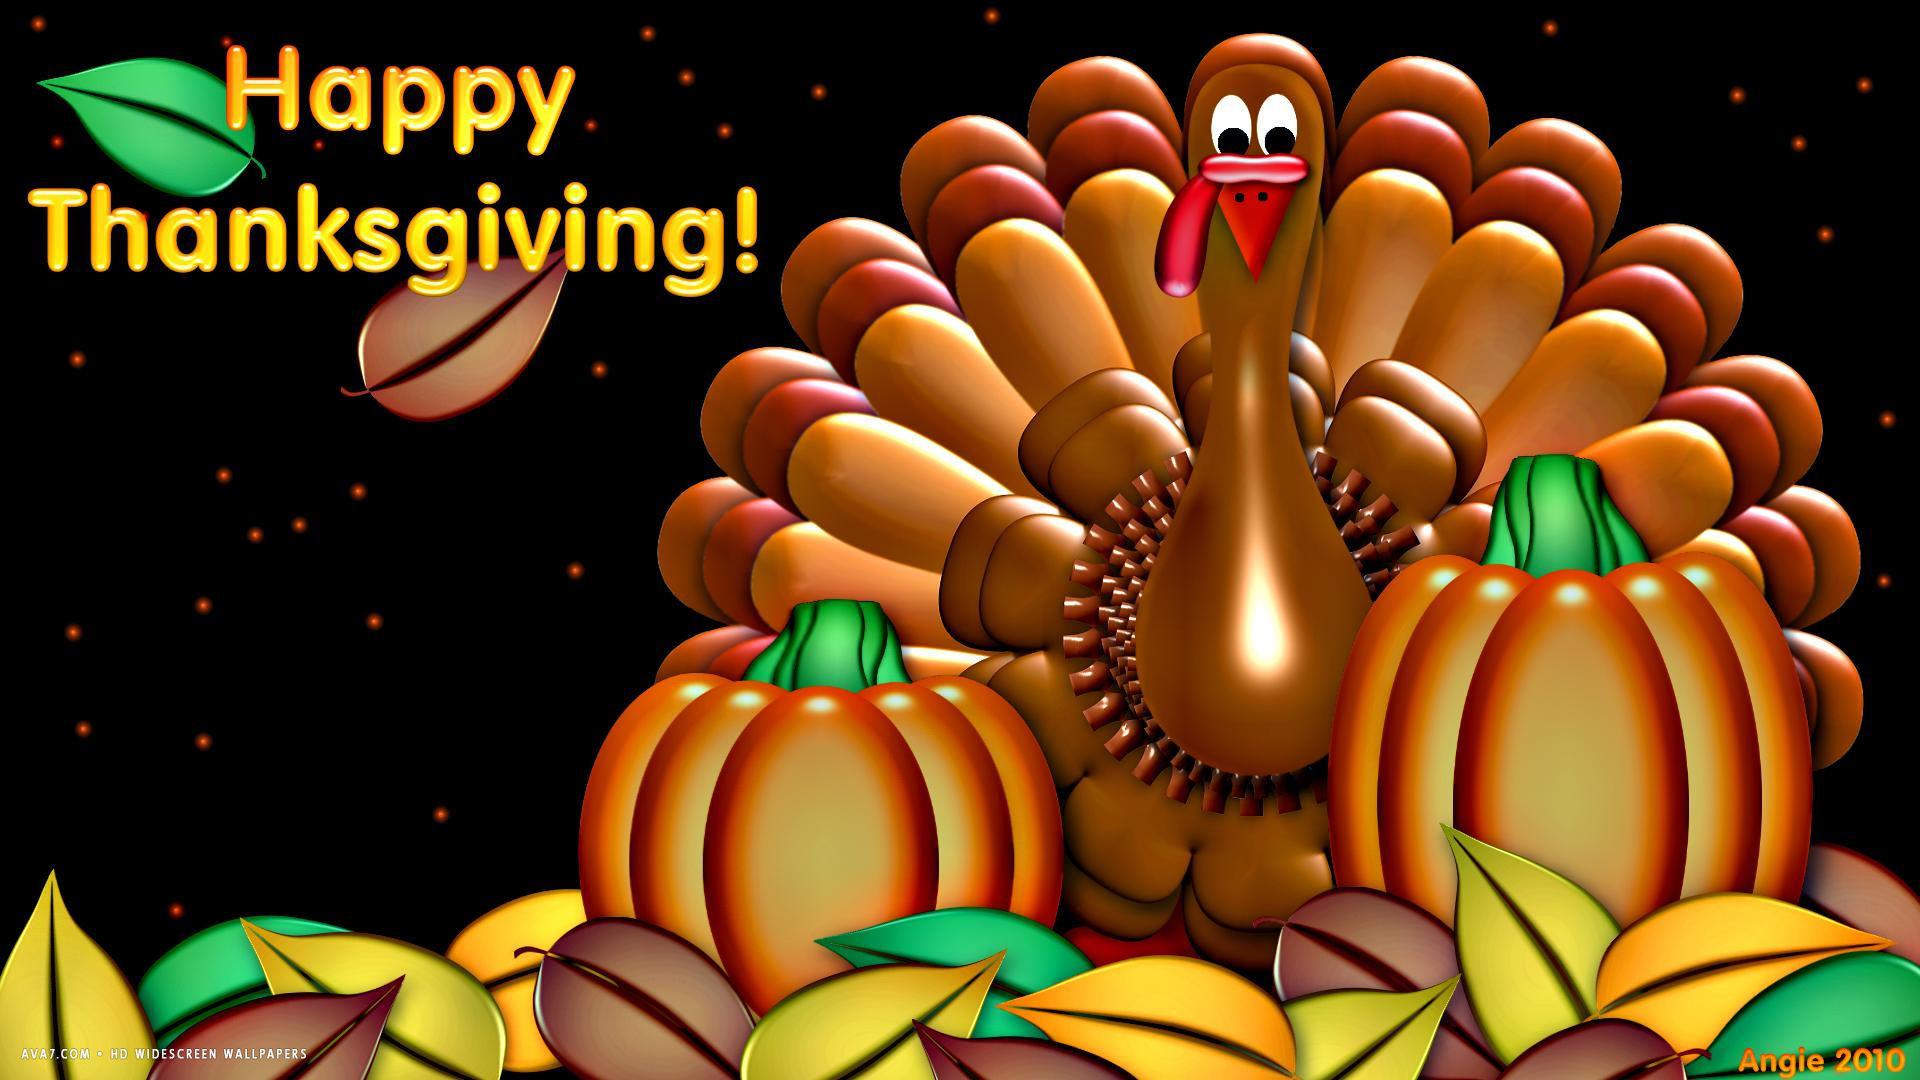 Res: 1920x1080, happy thanksgiving turkey pumpkin artistic holiday hd widescreen wallpaper